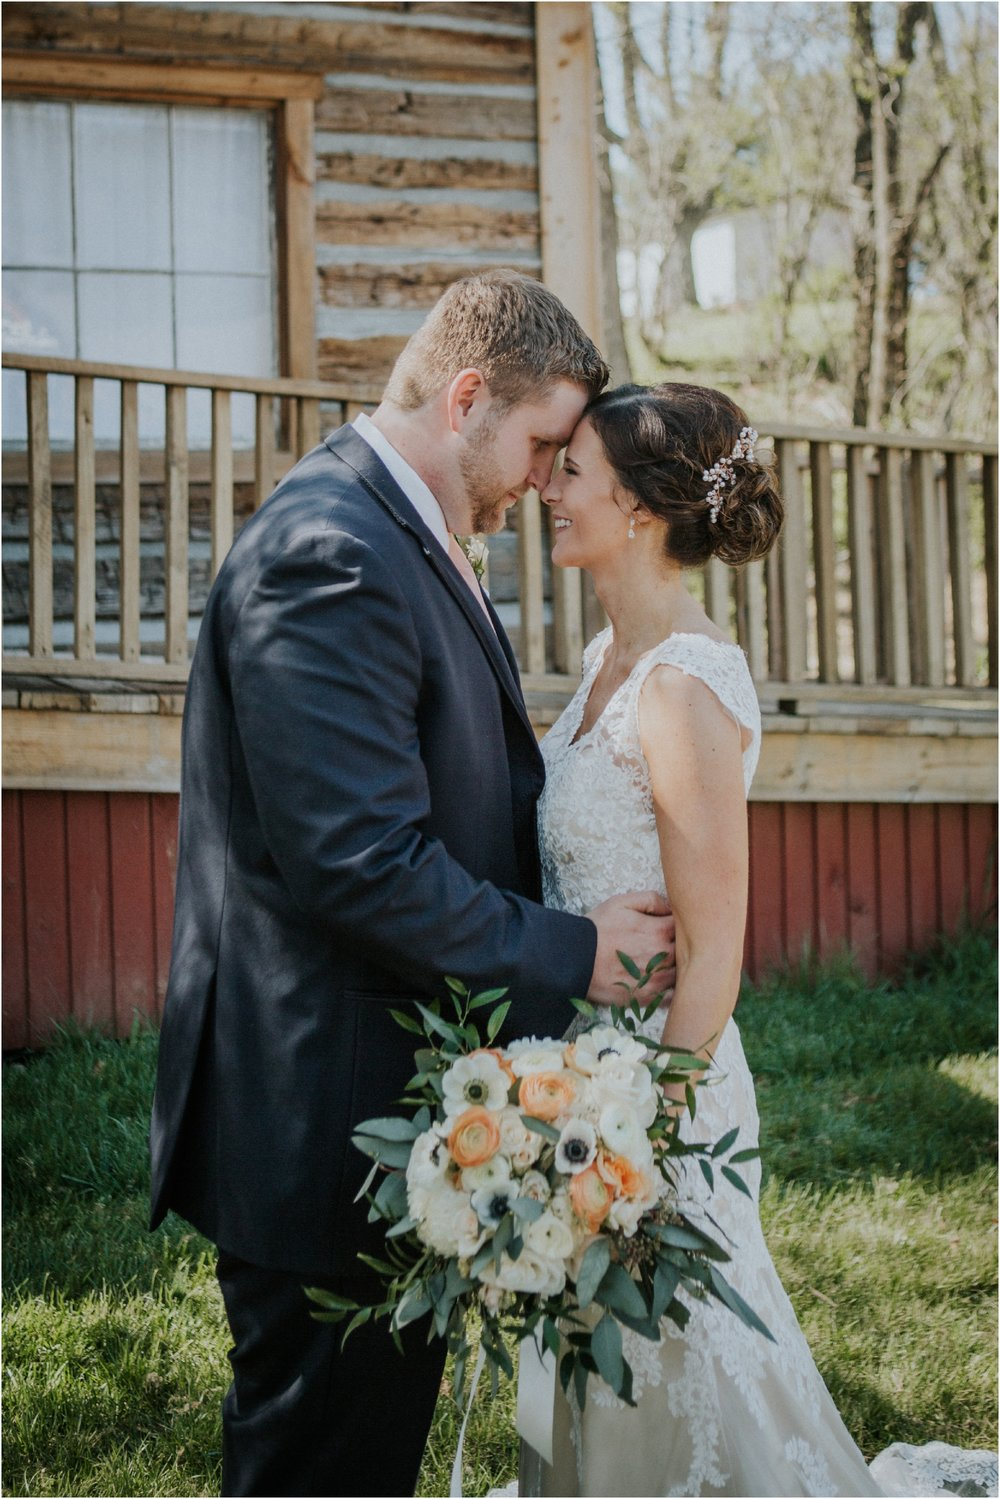 millstone-limestone-tn-tennessee-rustic-outdoors-pastel-lodge-cabin-venue-wedding-katy-sergent-photographer_0055.jpg